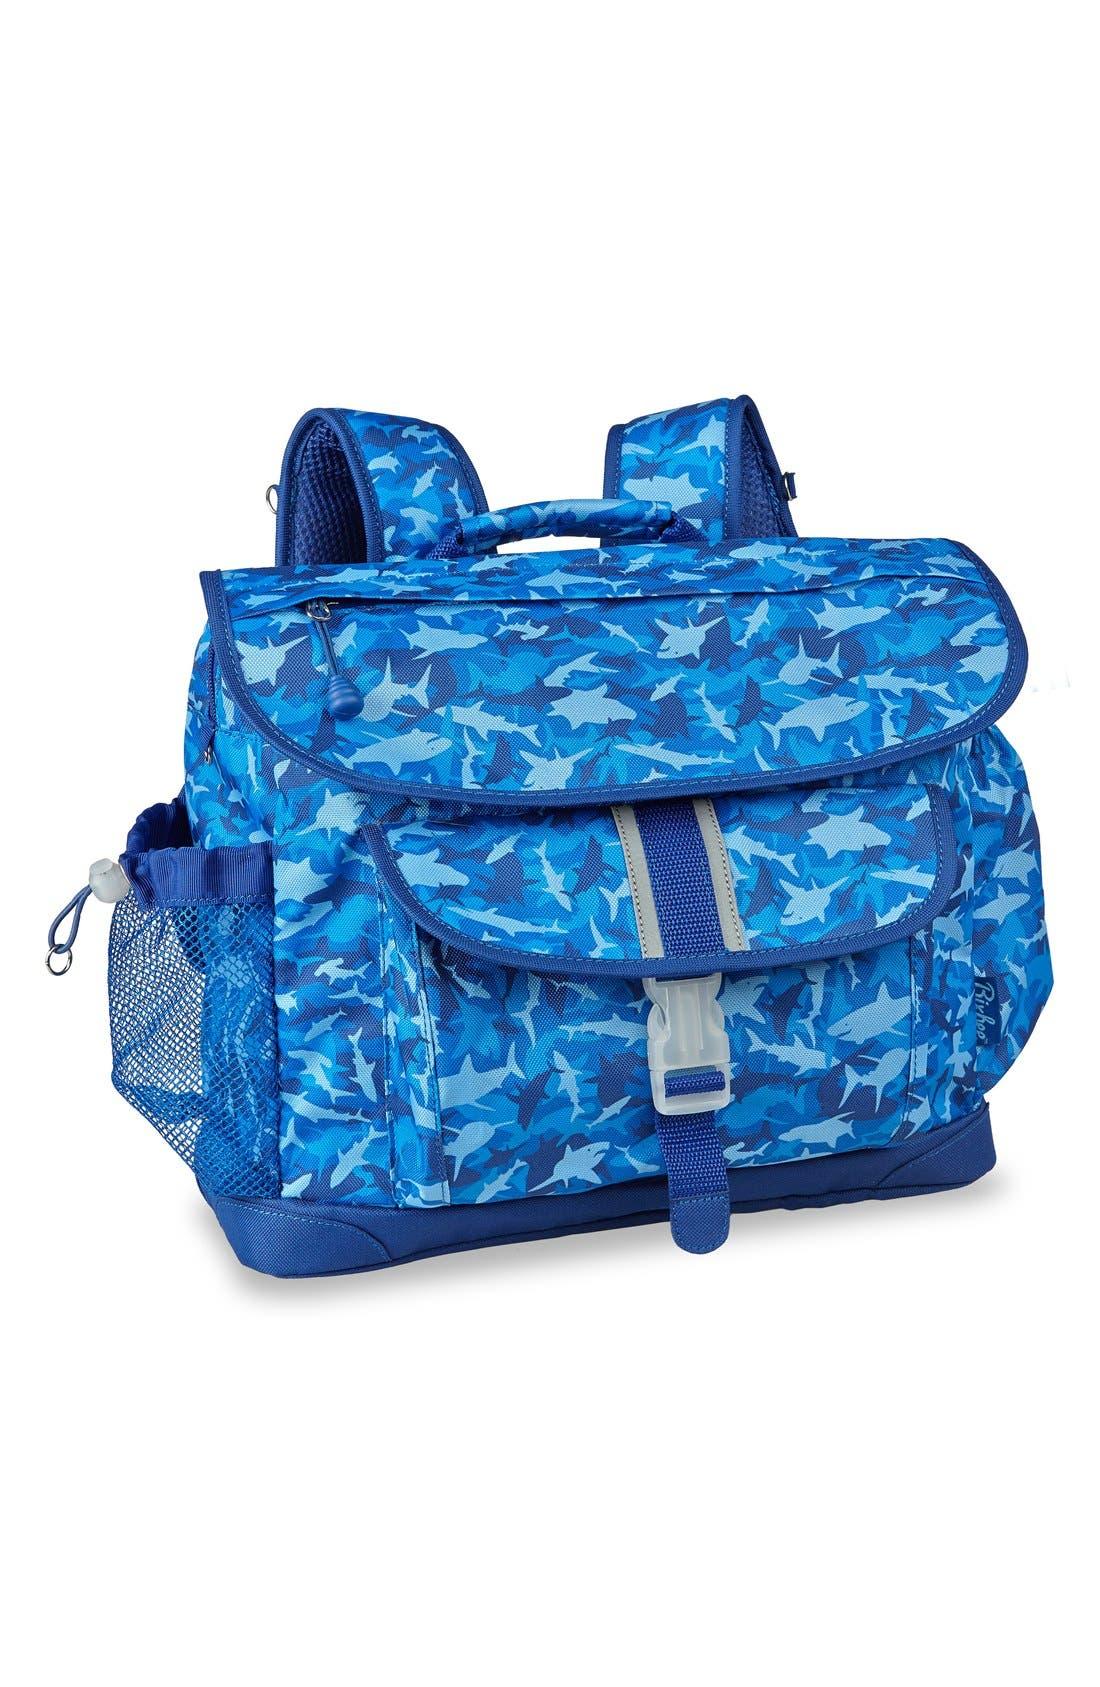 Bixbee 'Large Shark Camo' Water Resistant Backpack (Kids)